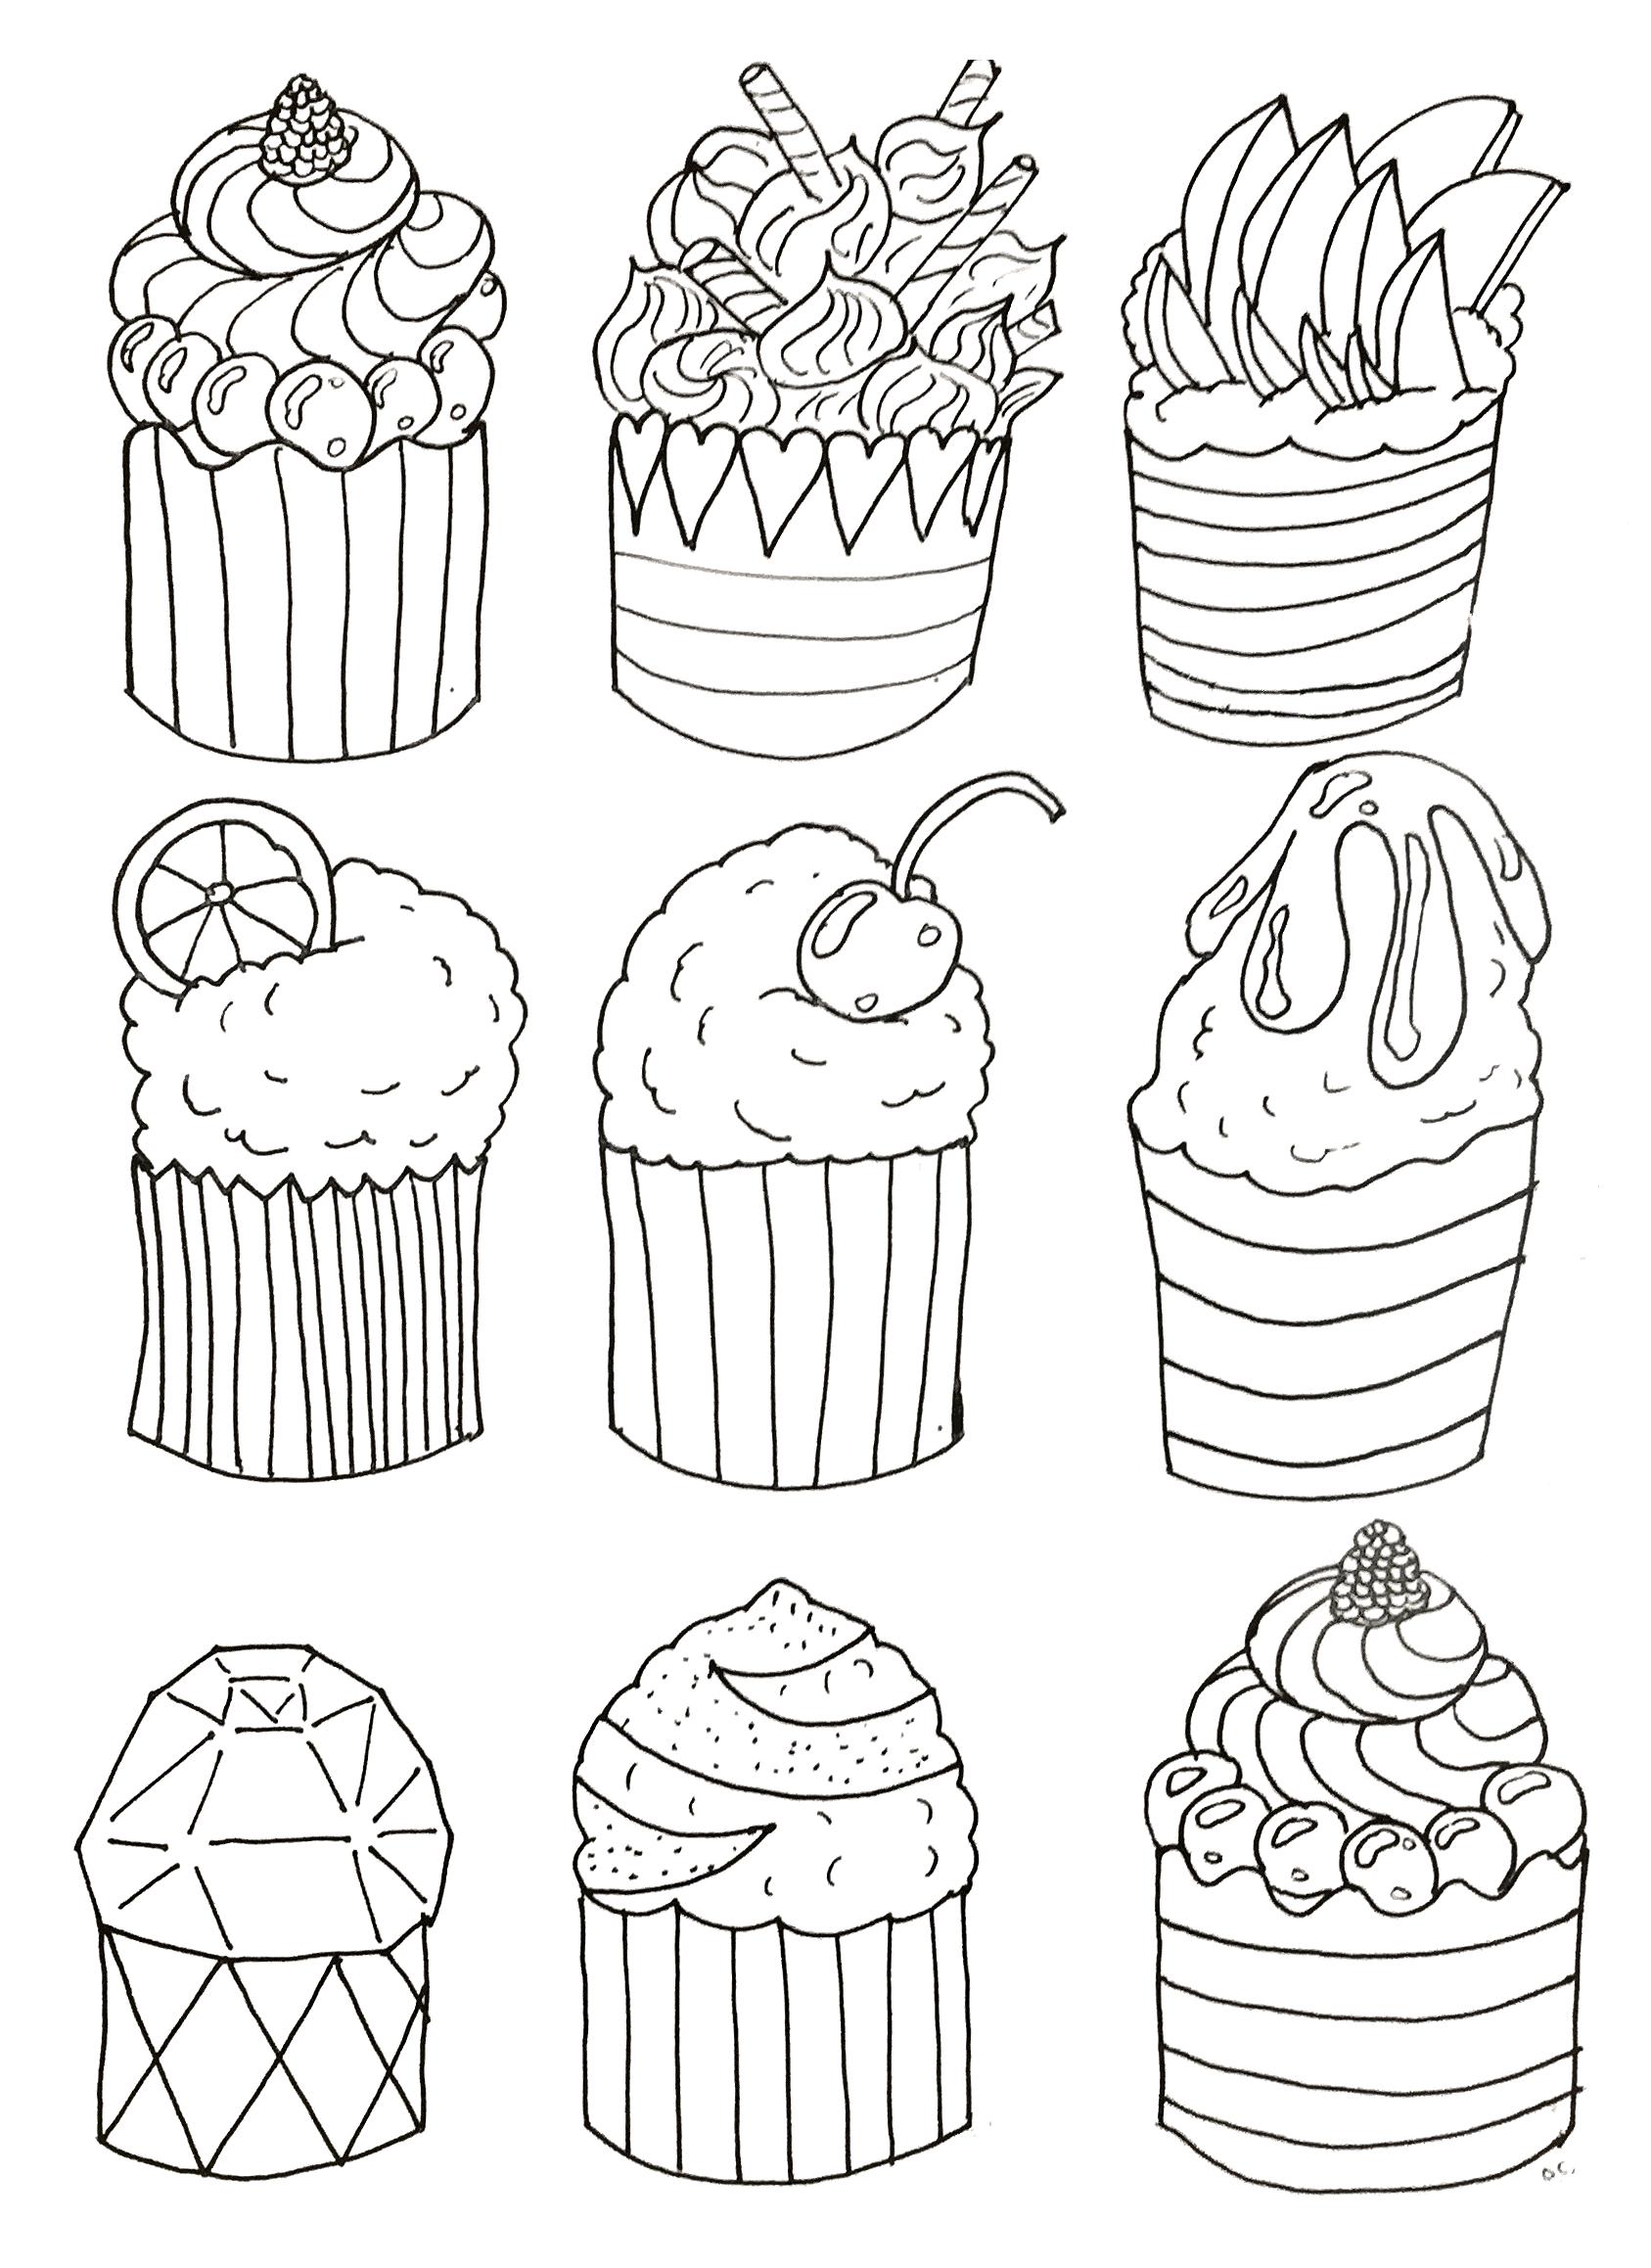 Coloriage Cupcake Adulte A Imprimer.Pour Simple Cup Cakes Coloriage Adulte Coloriages Pour